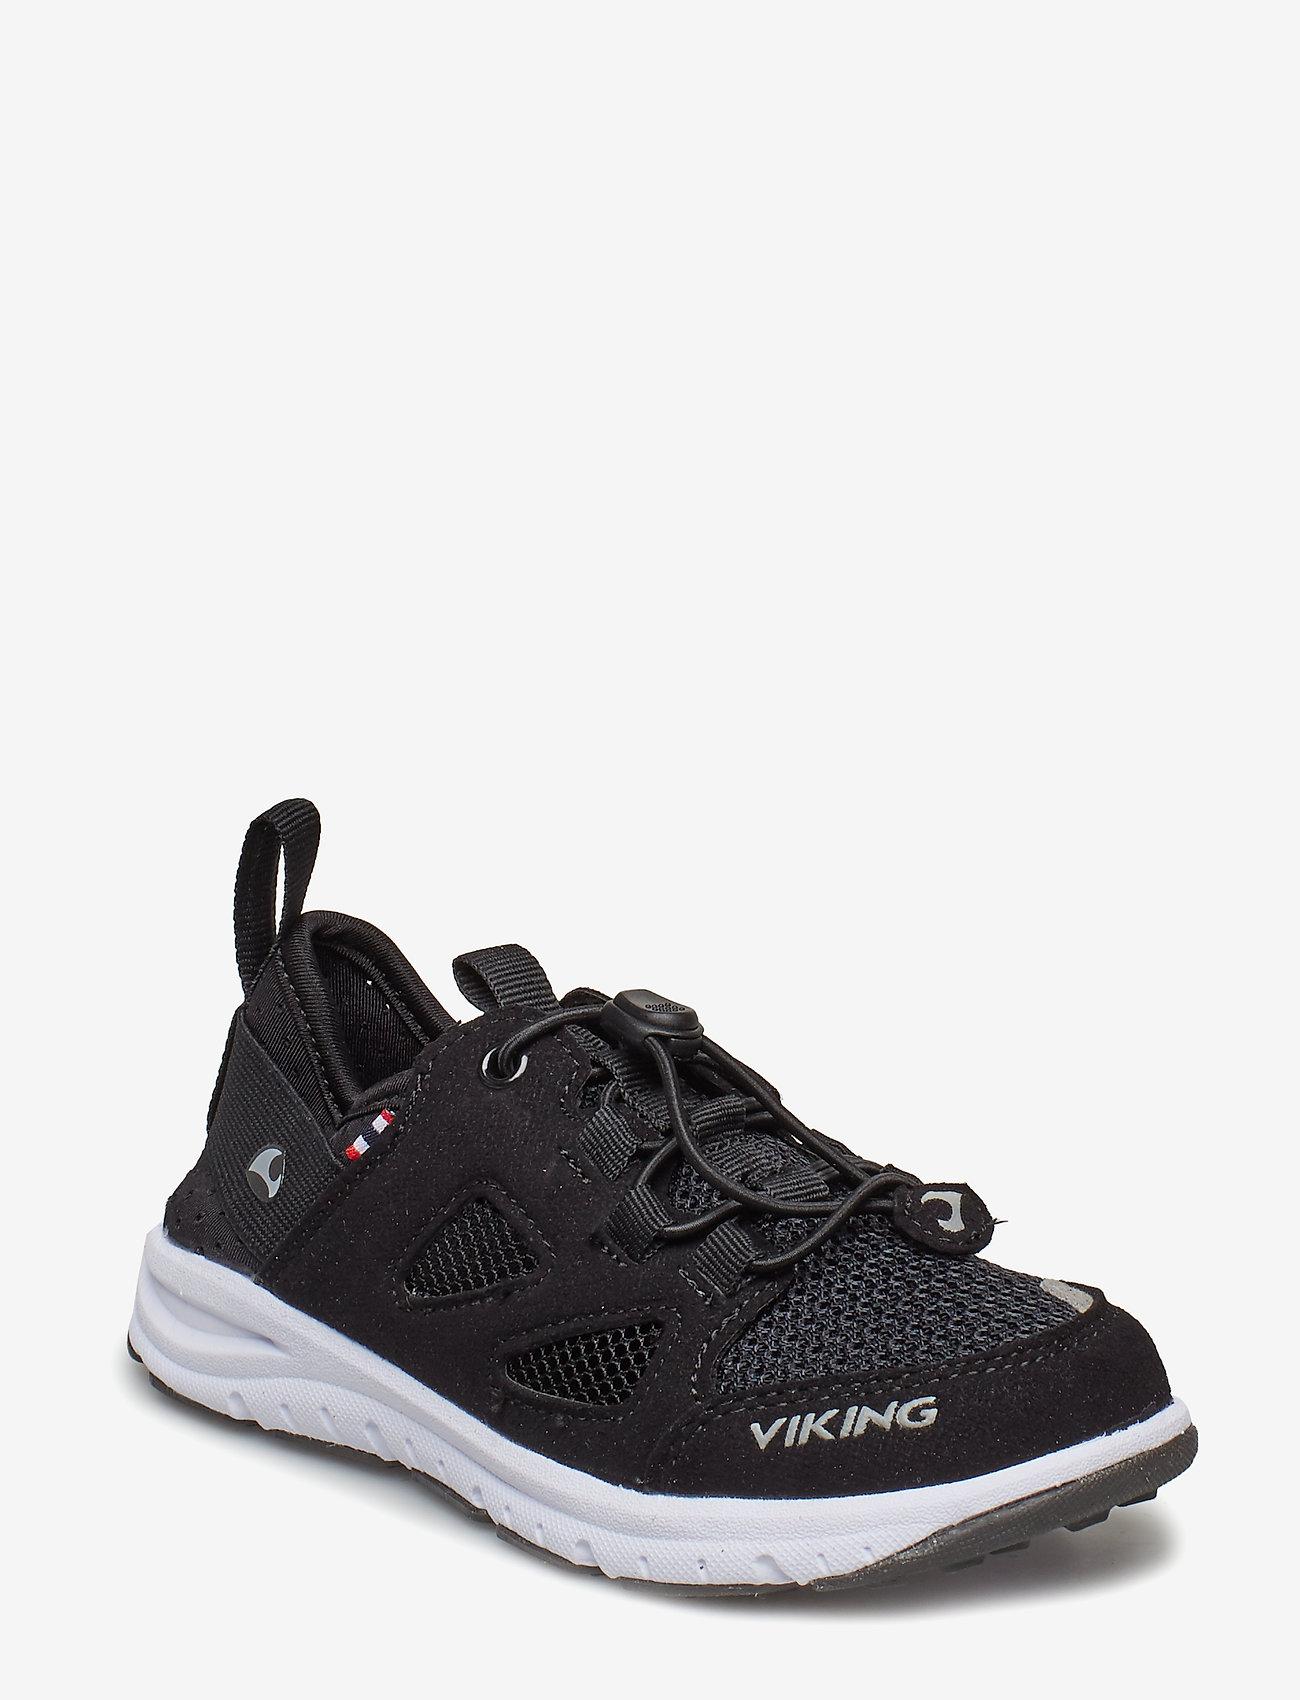 Viking - Bjerke - sport shoes - black - 0